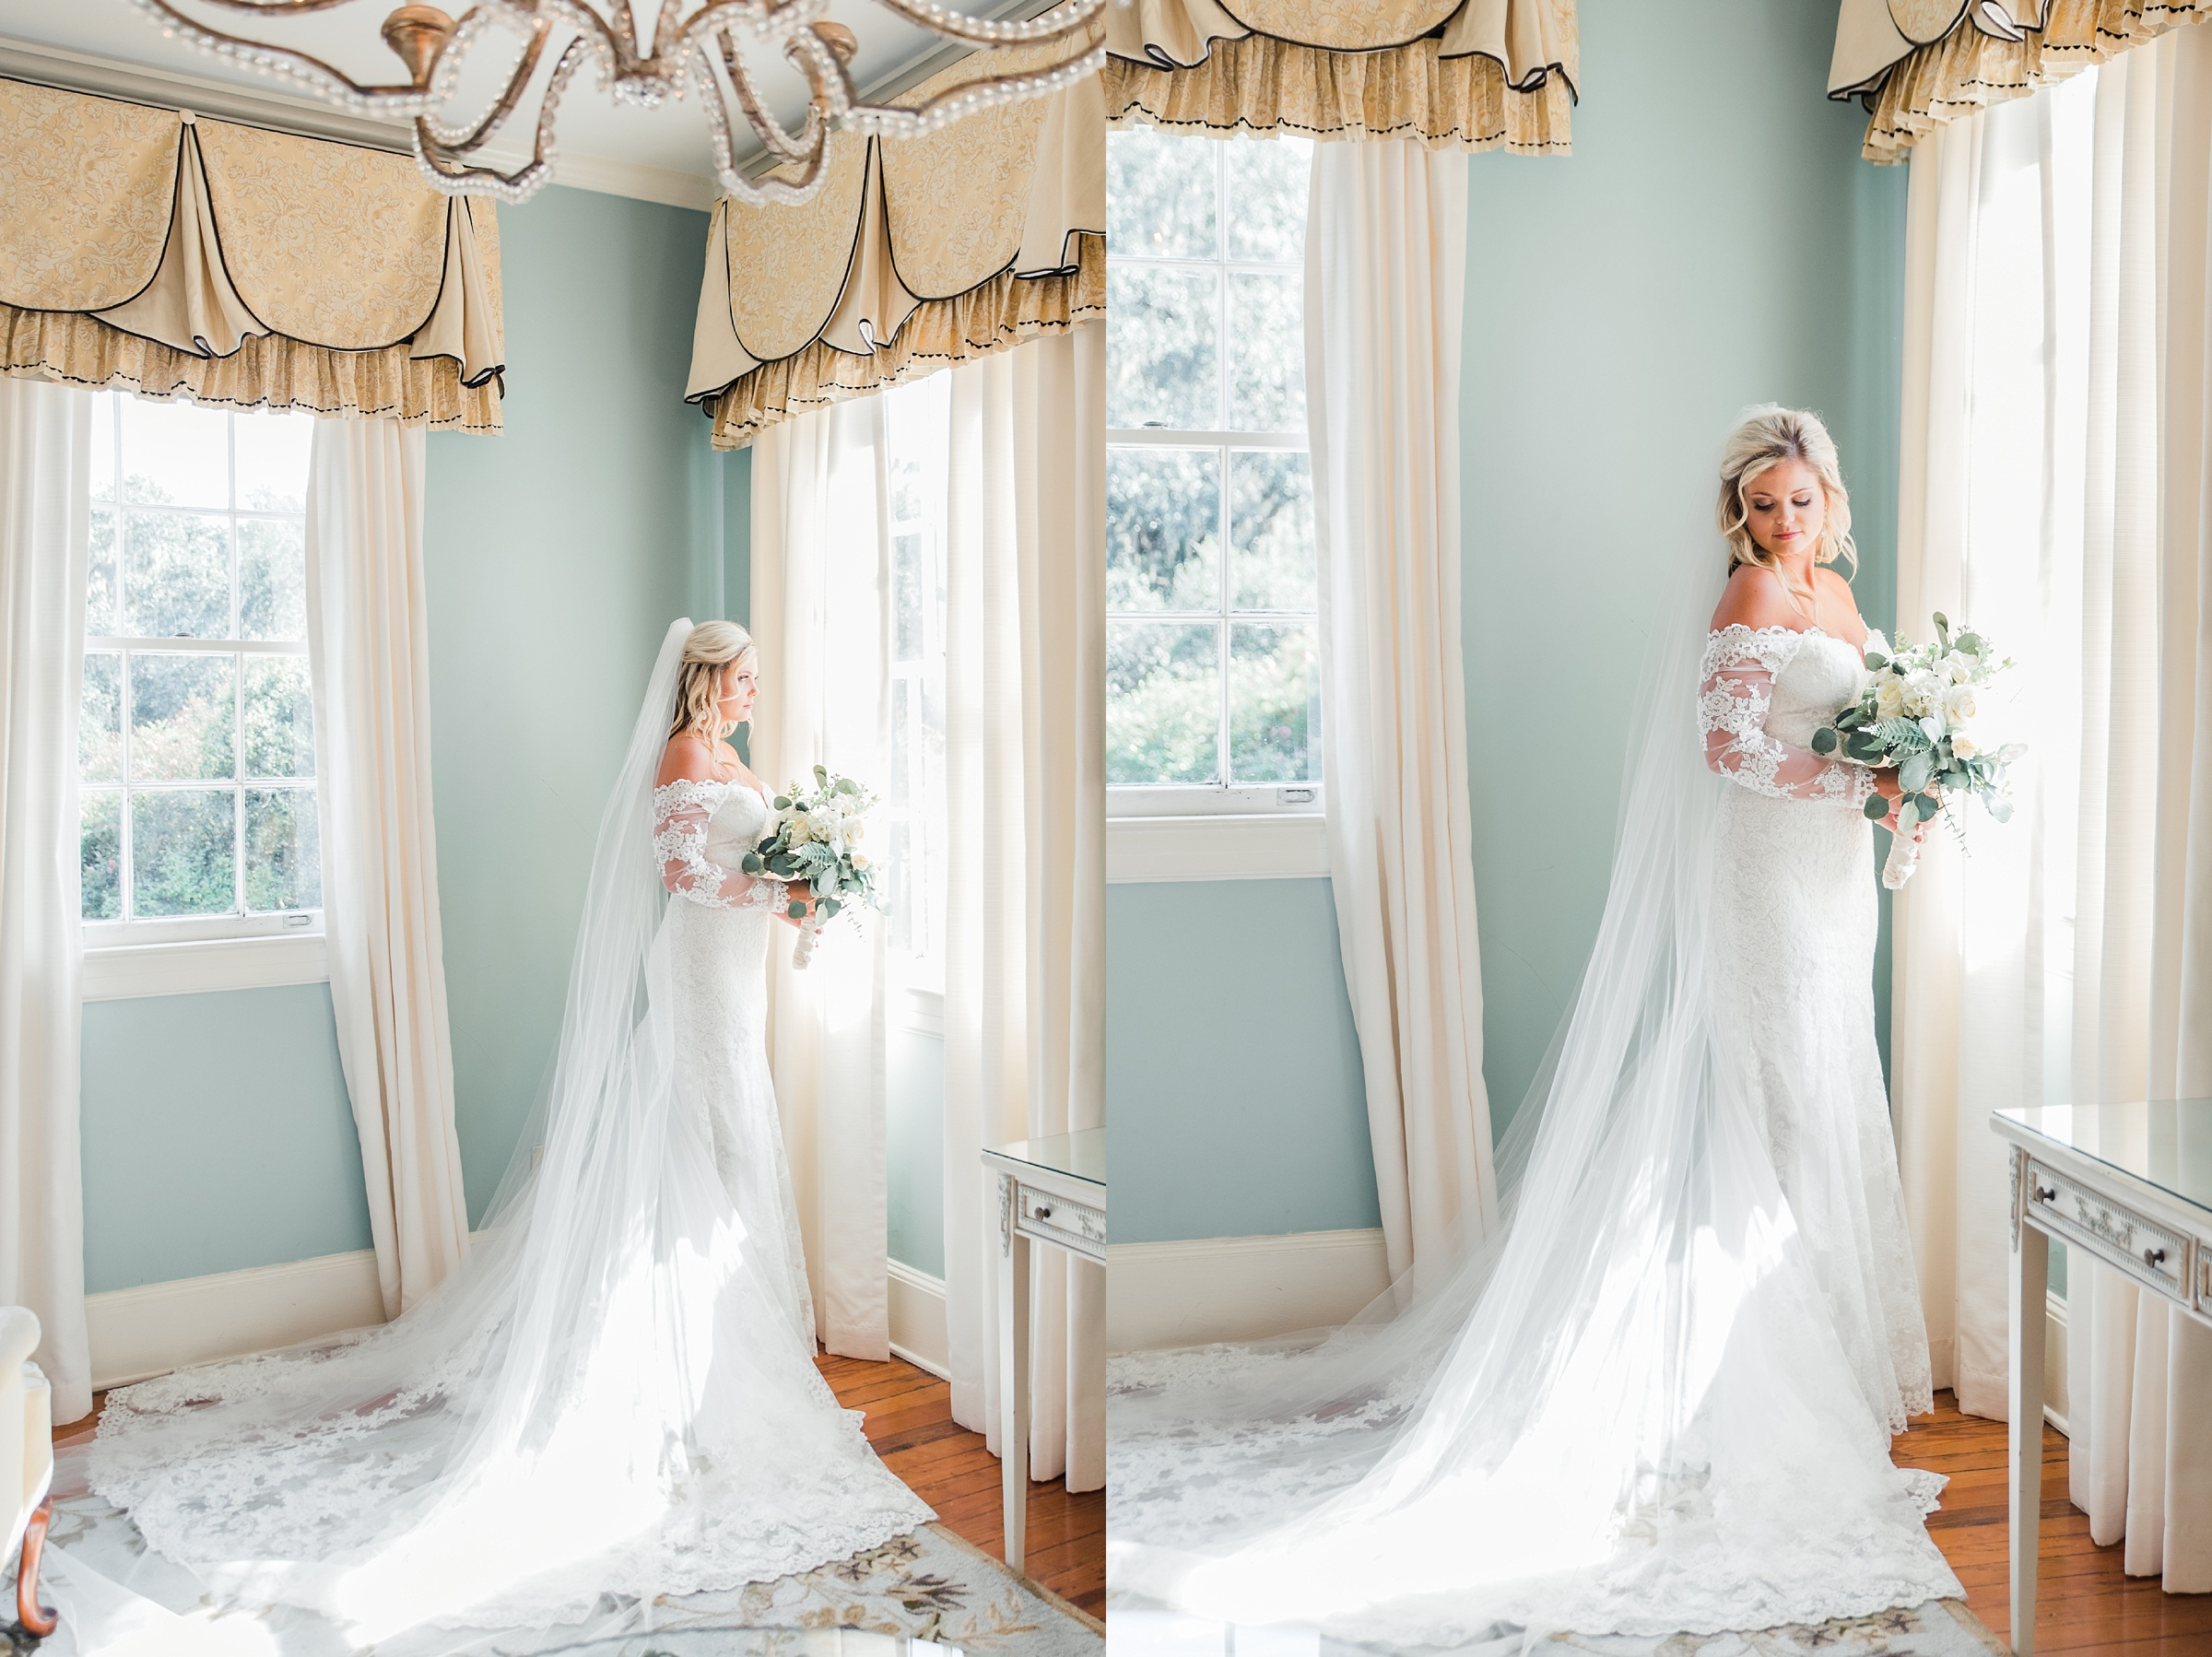 legare waring house bridal session charleston sc film hybrid wedding photographer